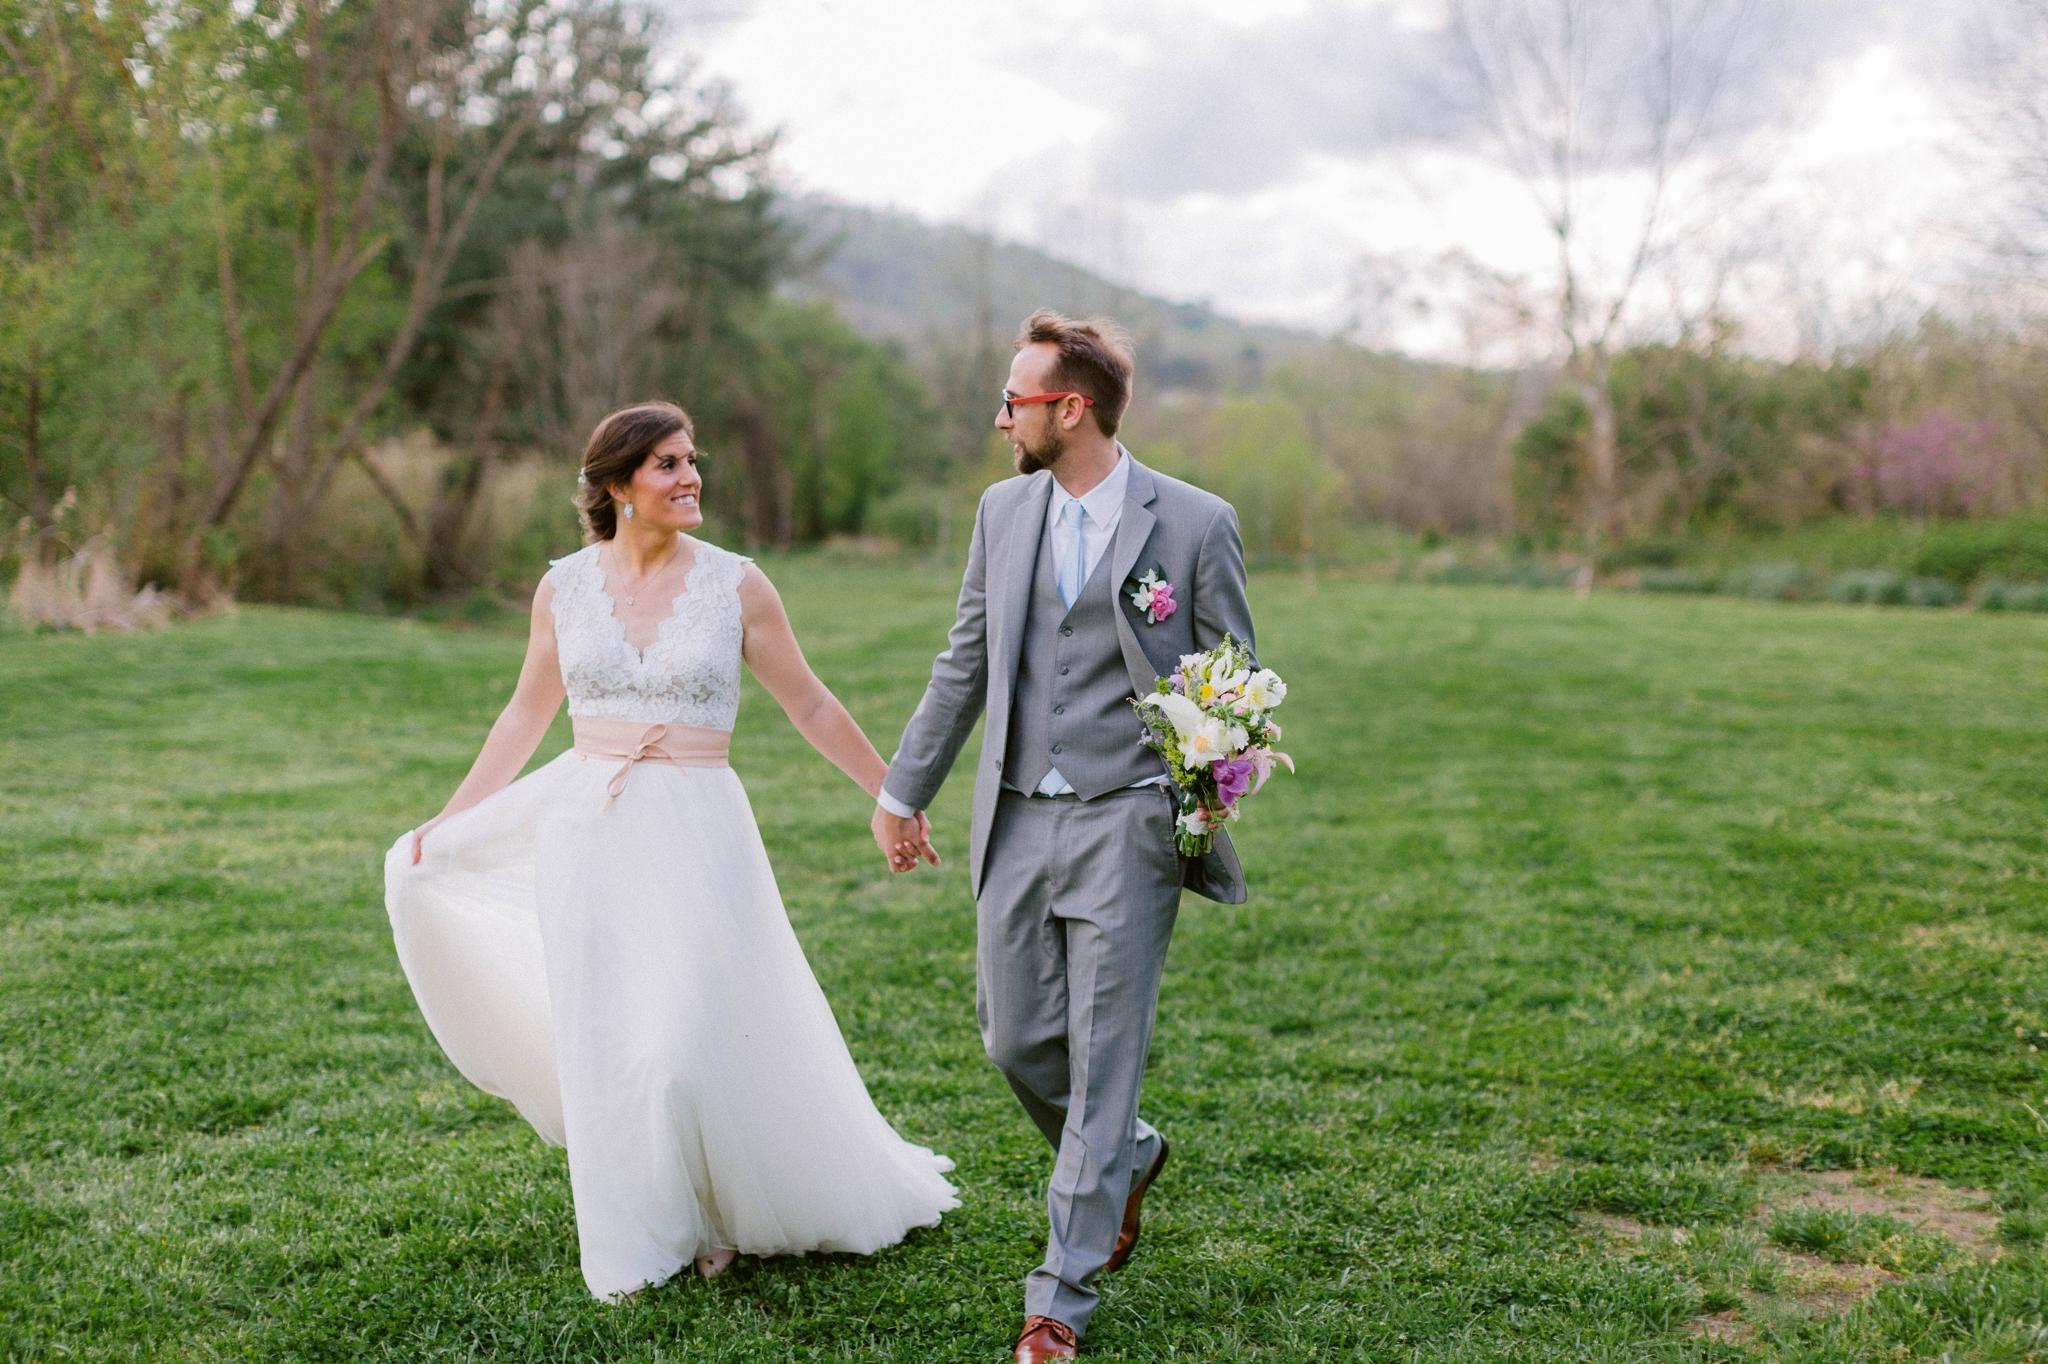 bride and groom portraits - Honolulu Oahu Hawaii Wedding Photographer